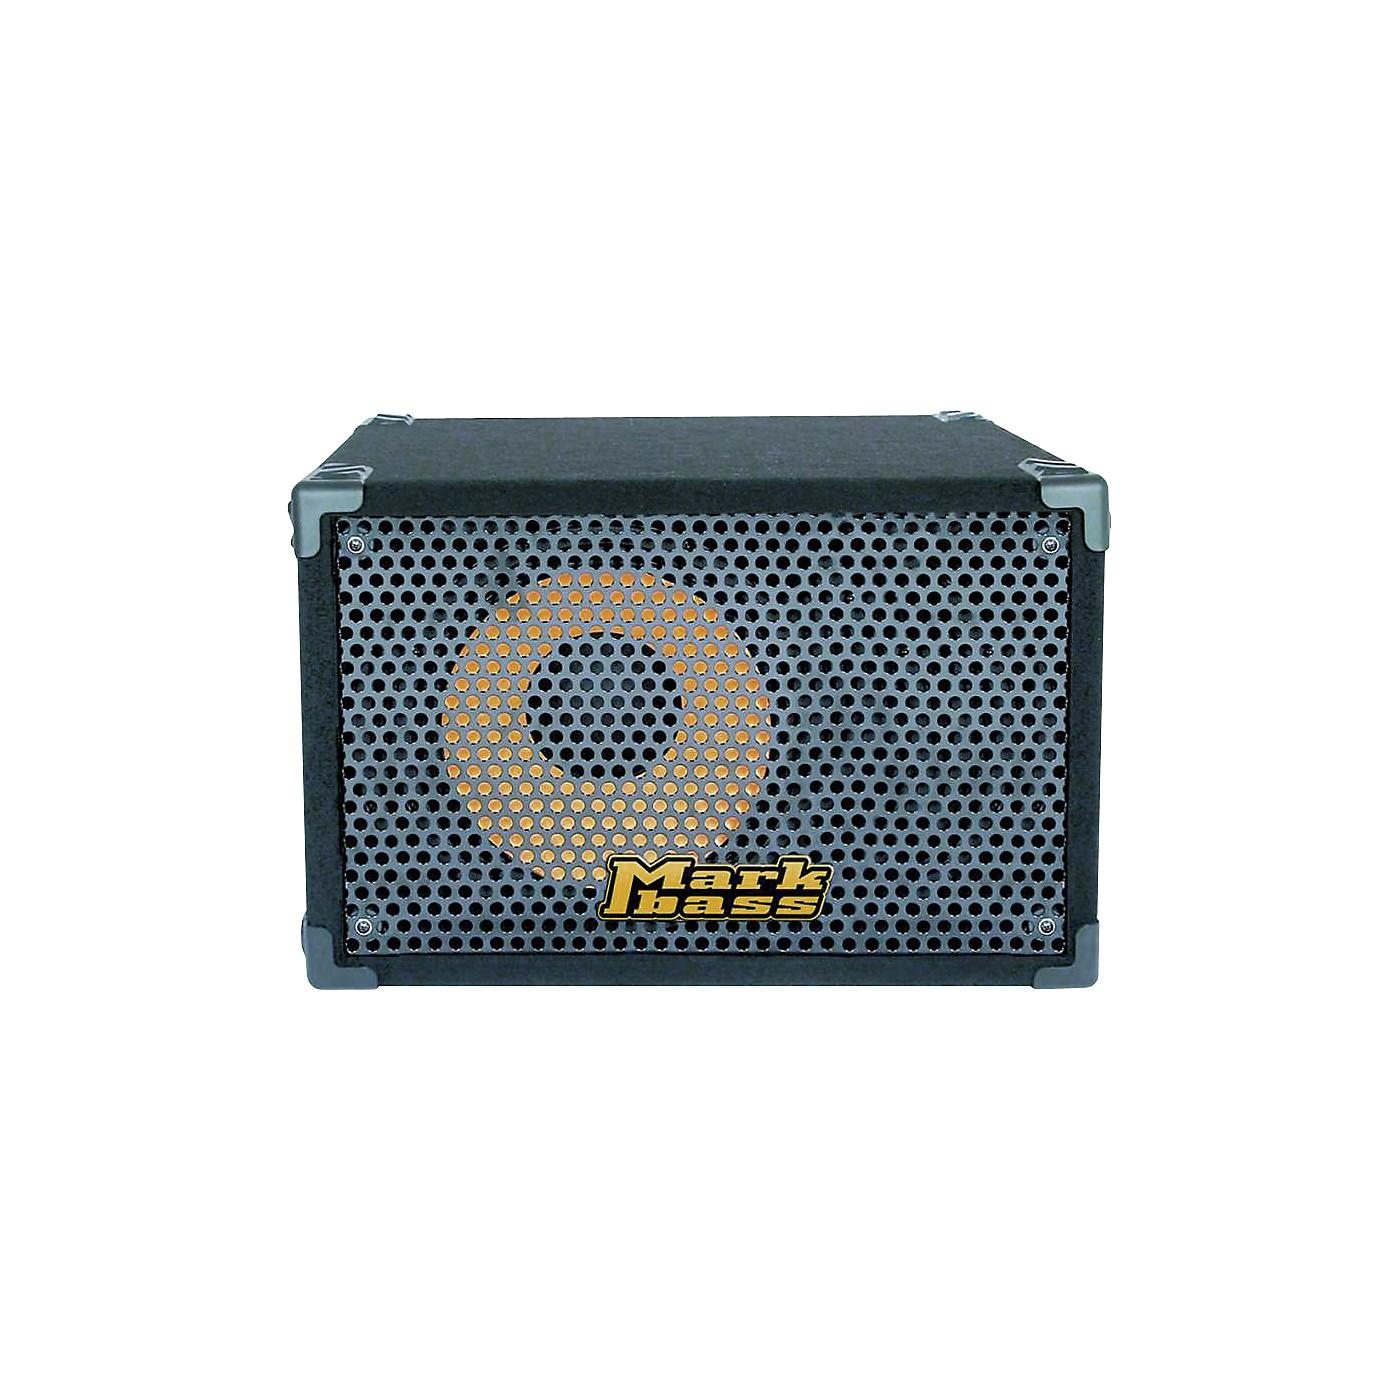 Markbass Traveler 121H Rear-Ported Compact 1x12 Bass Speaker Cabinet thumbnail